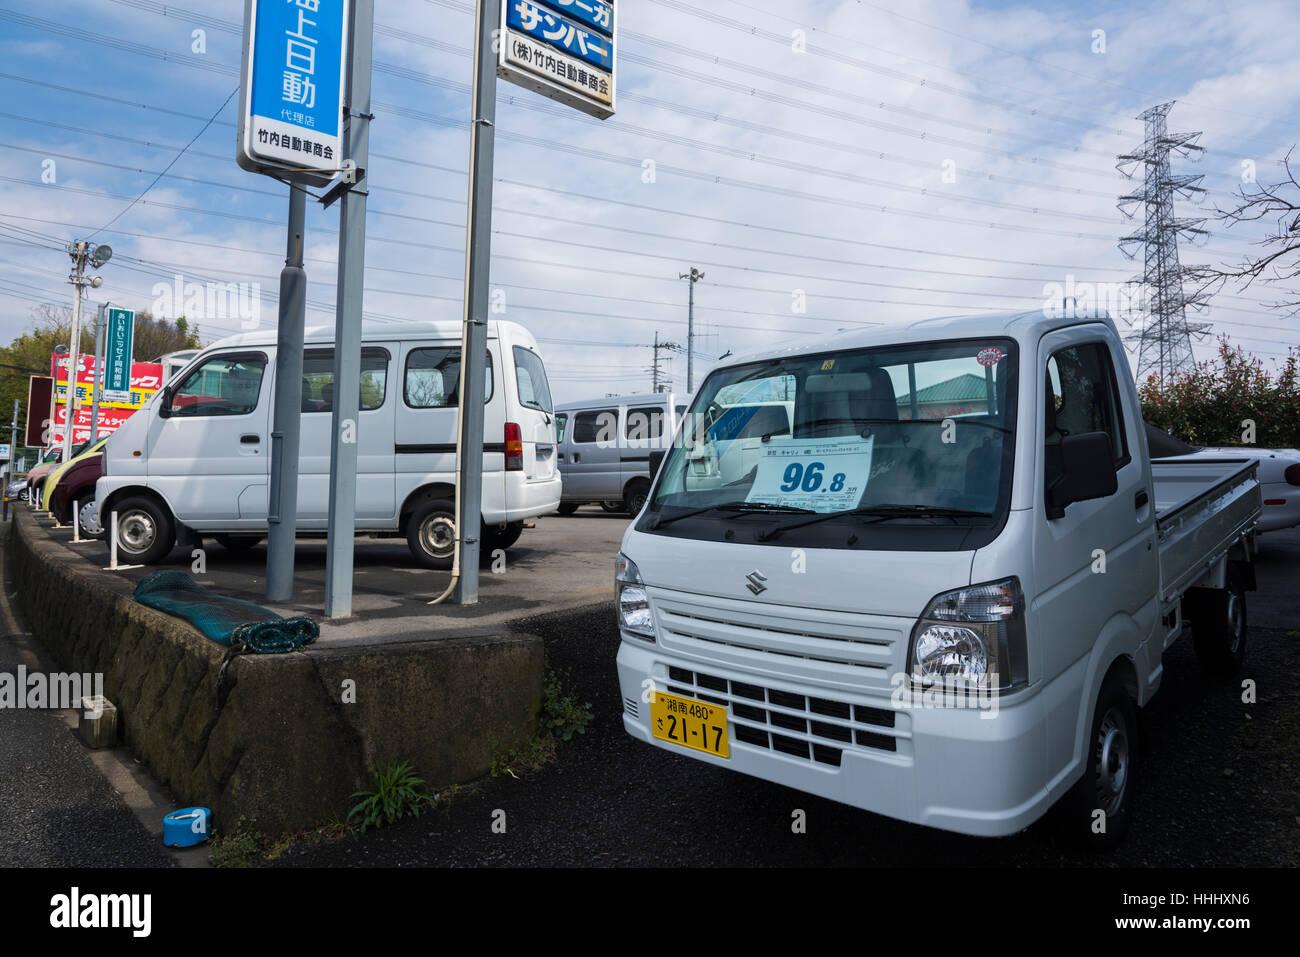 Used Car Shop, Isehara City, Kanagawa Prefecture, Japan - Stock Image